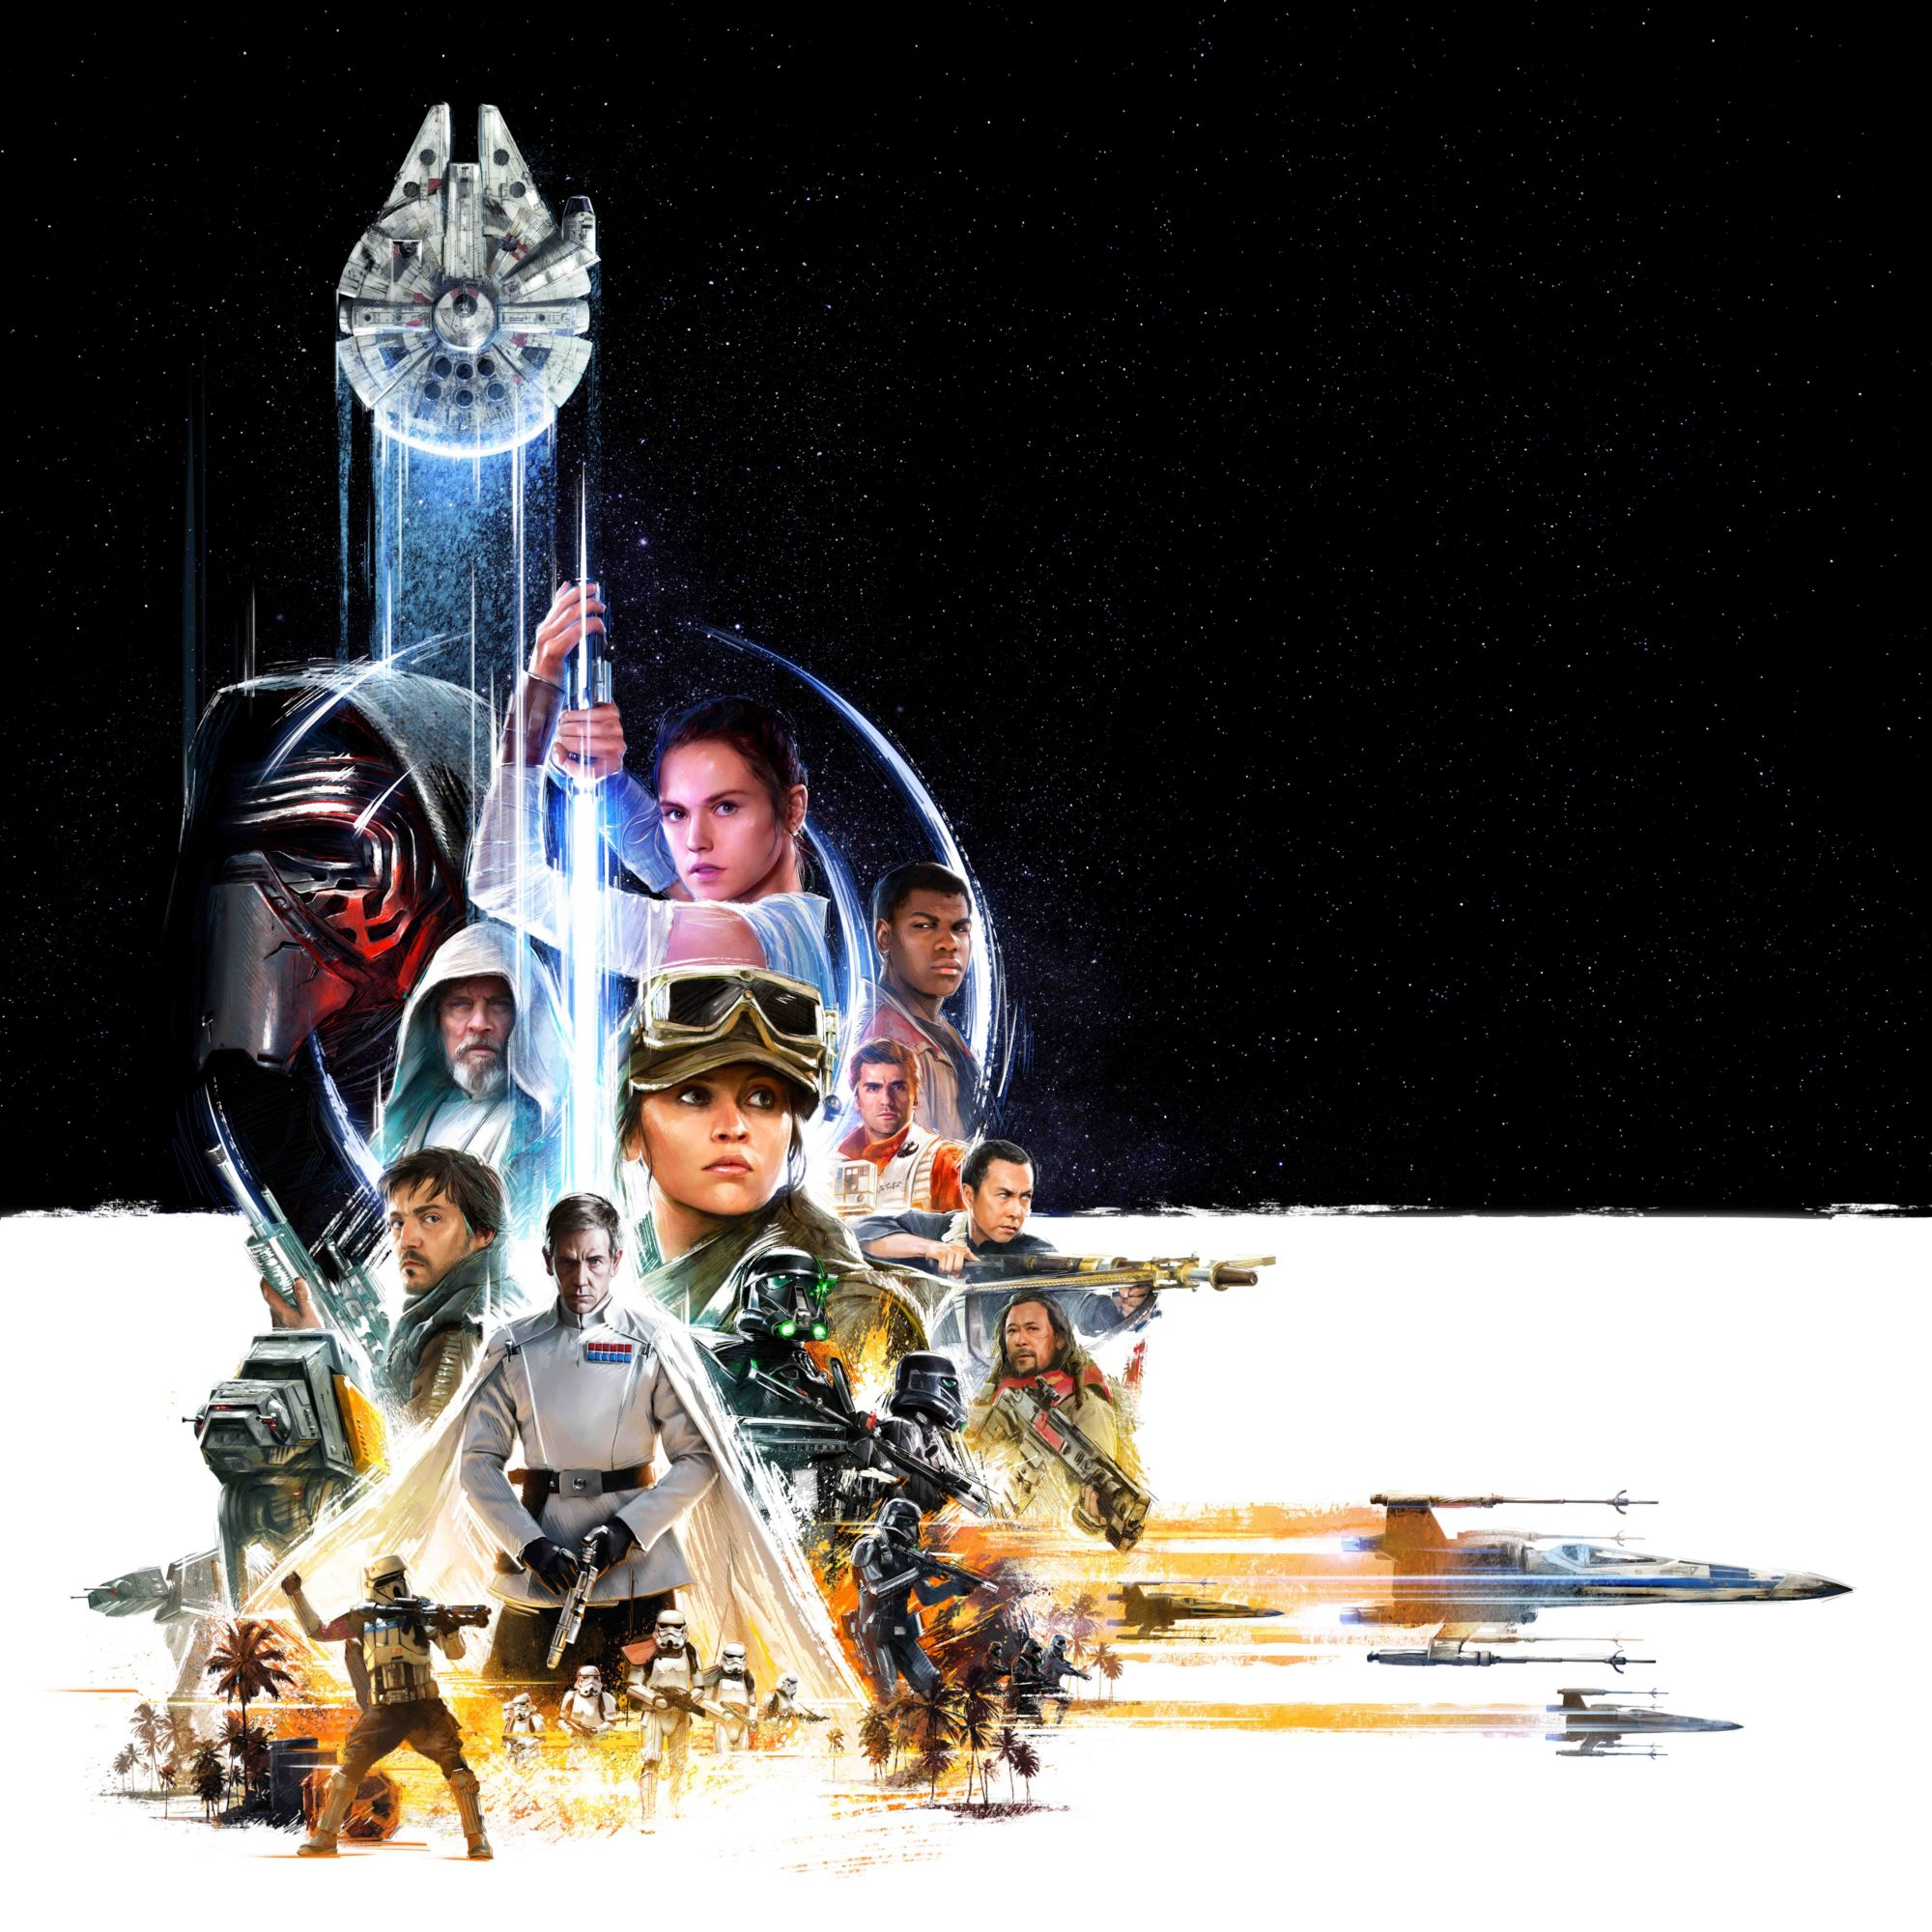 Celebration Episode VIII Rogue One